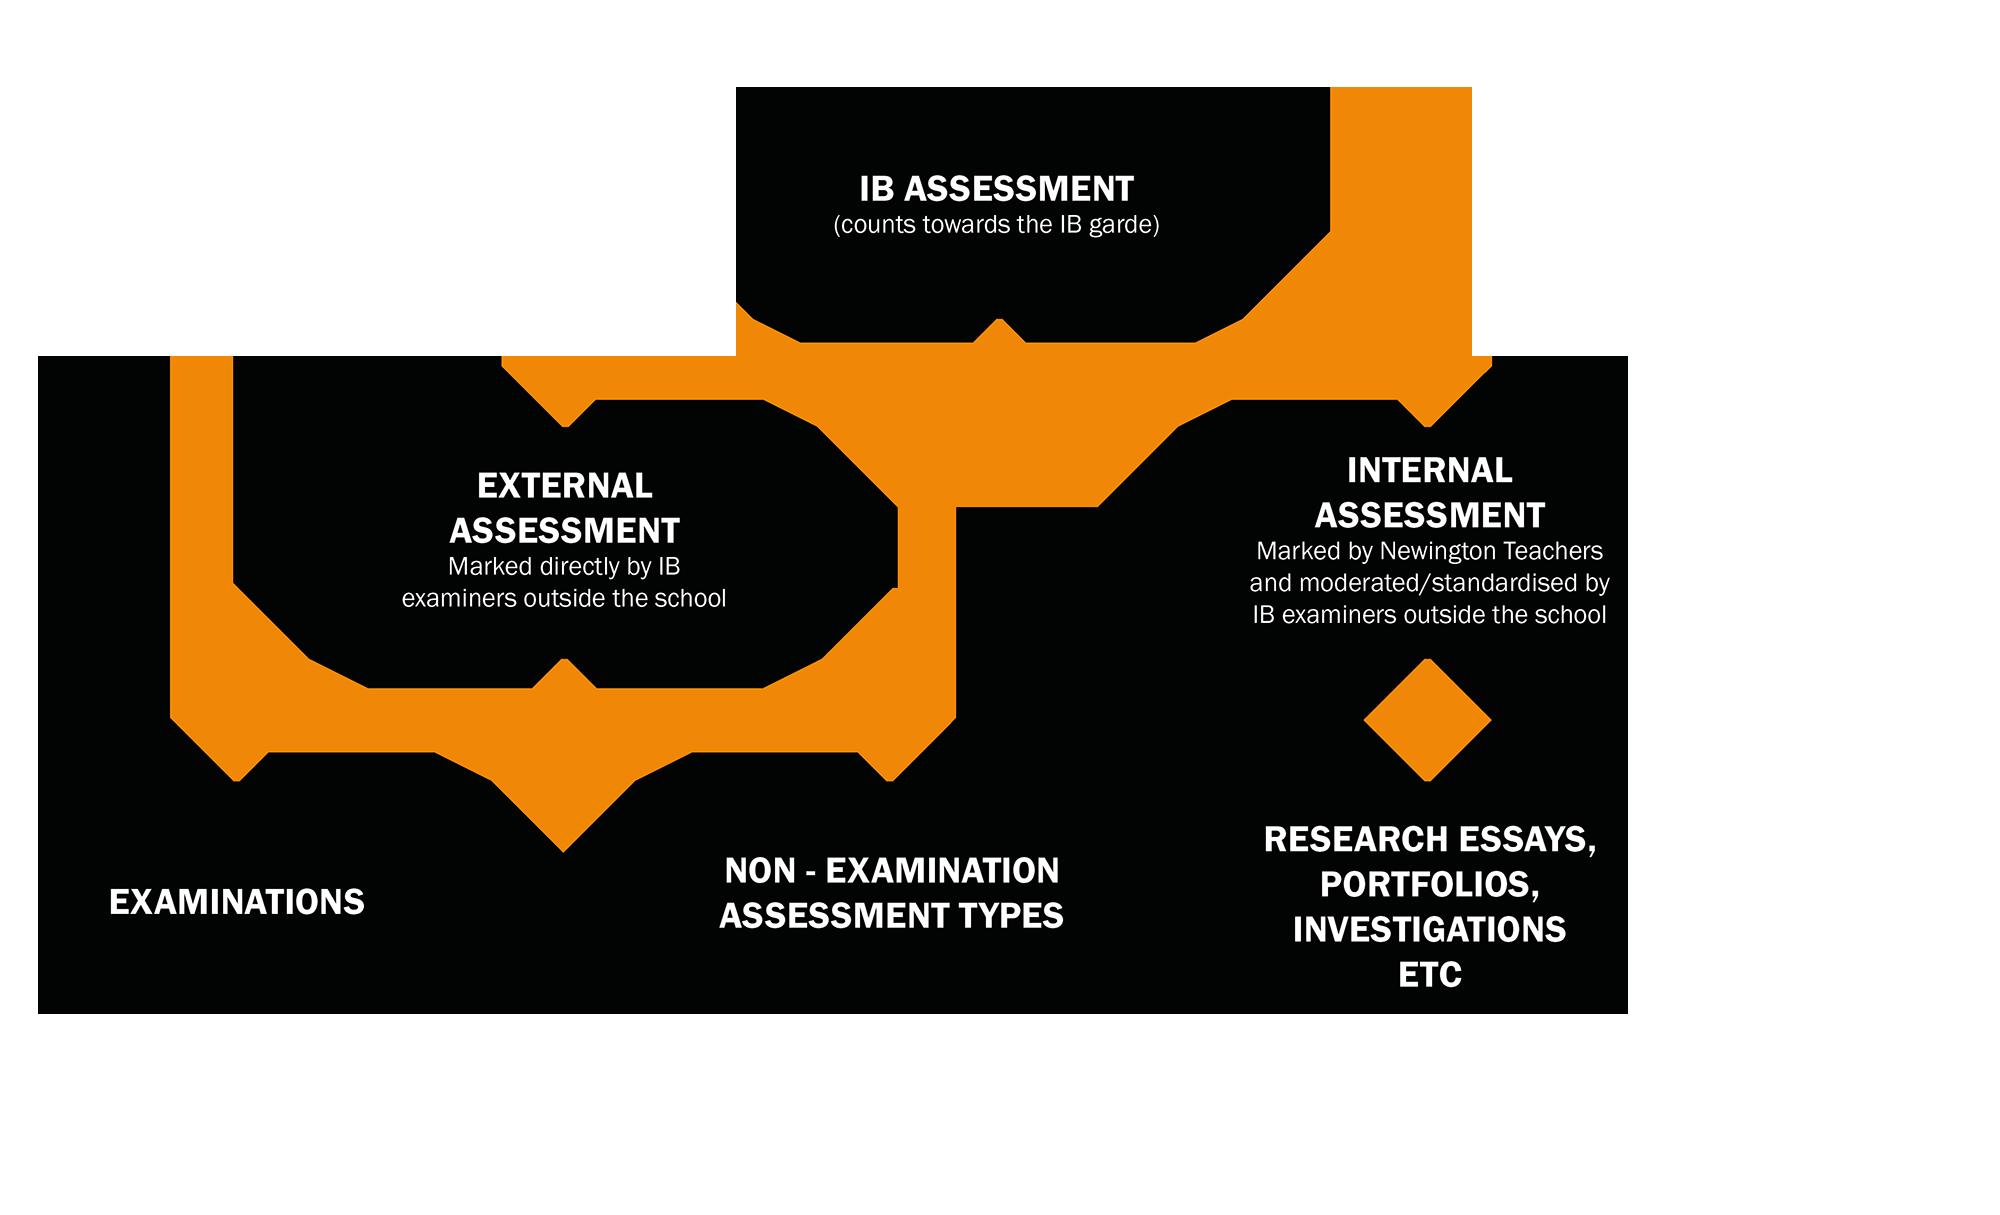 ib_assessment